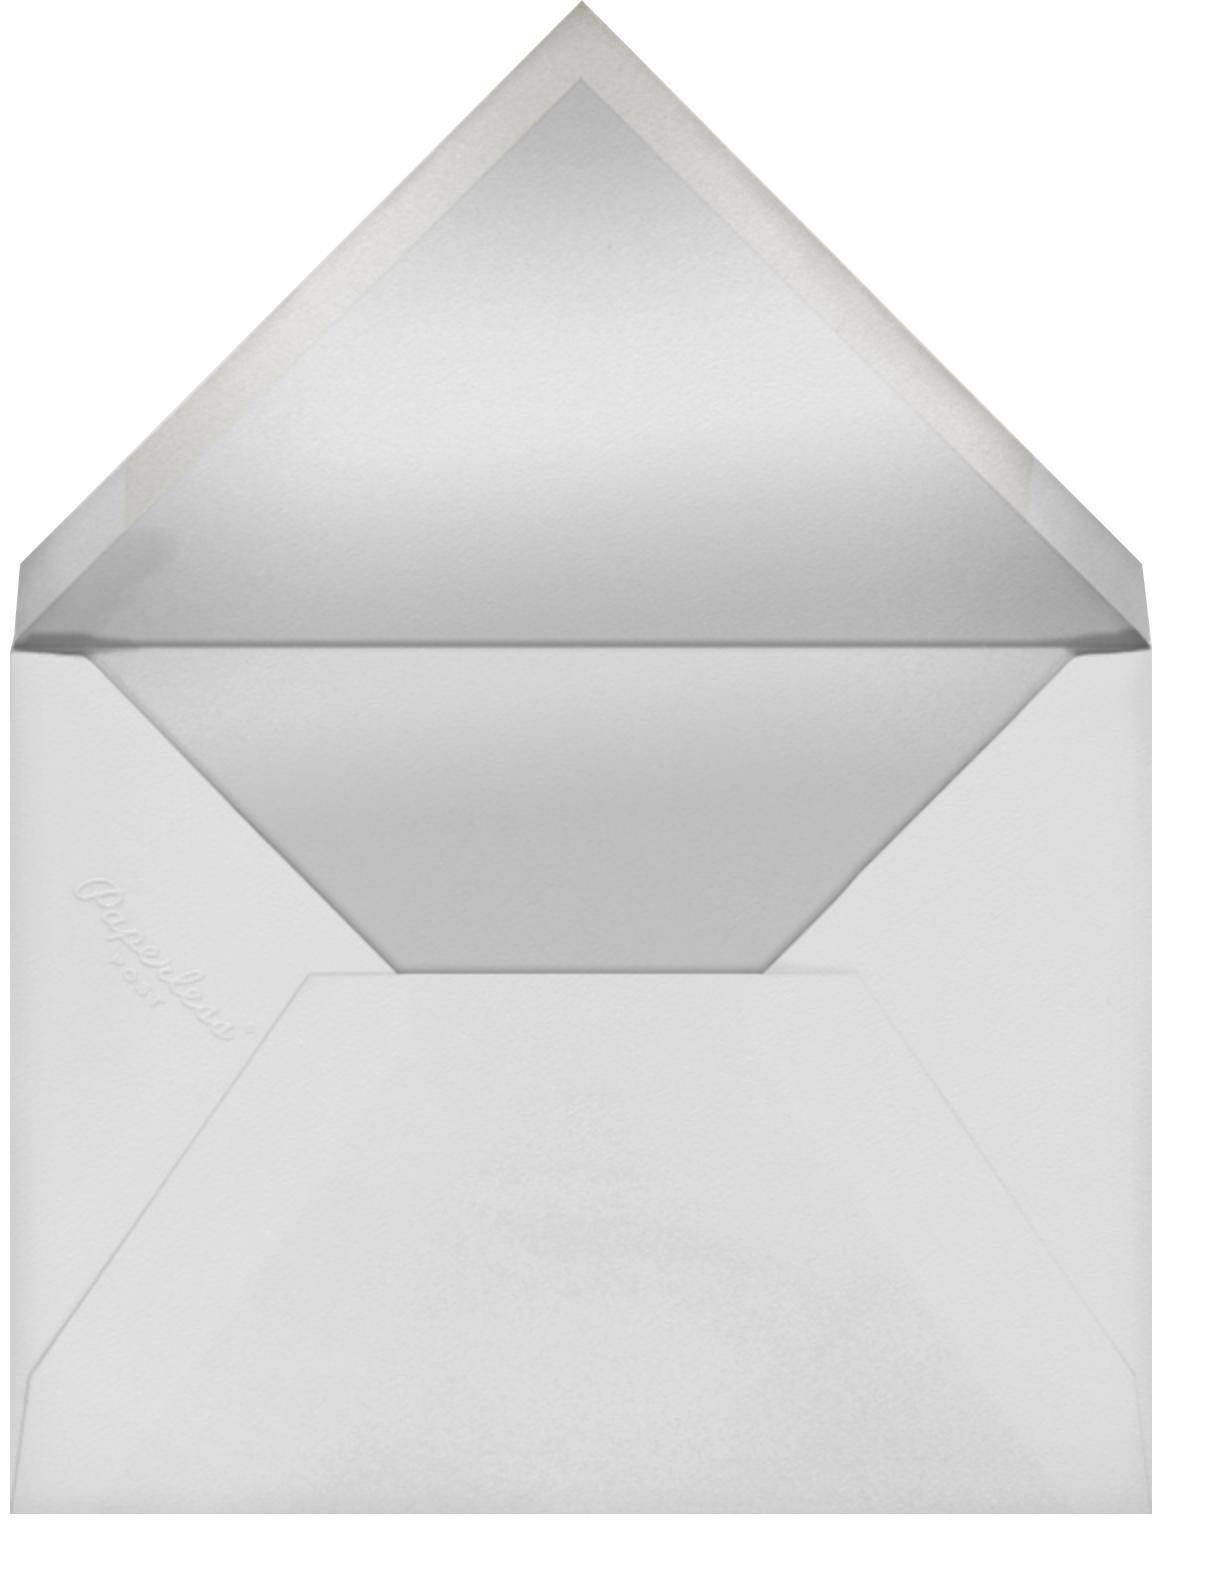 Josephine Baker (Menu) - White/Rose Gold - Paperless Post - Menus - envelope back